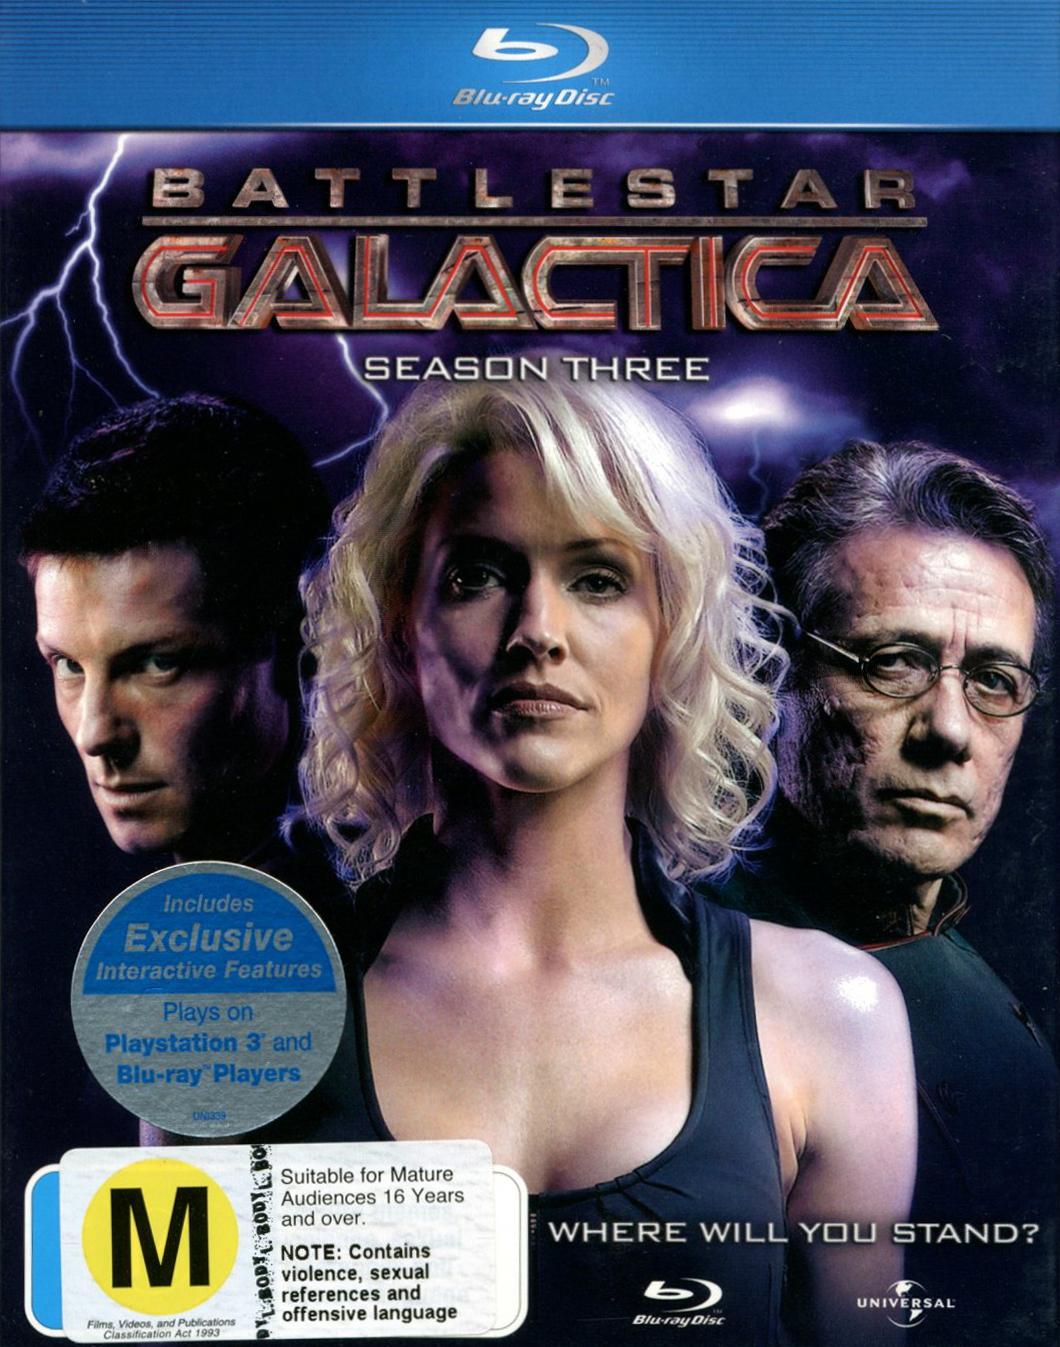 Battlestar Galactica - The Complete Third Season on Blu-ray image